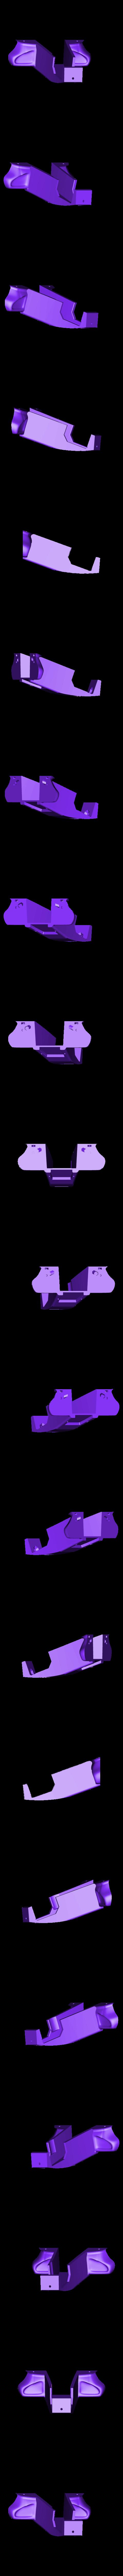 OpenRC_2017_MCL_Front_Color1.stl Download free STL file OpenRC F1 Dual Color McLaren Edition • 3D printer model, DanielNoree